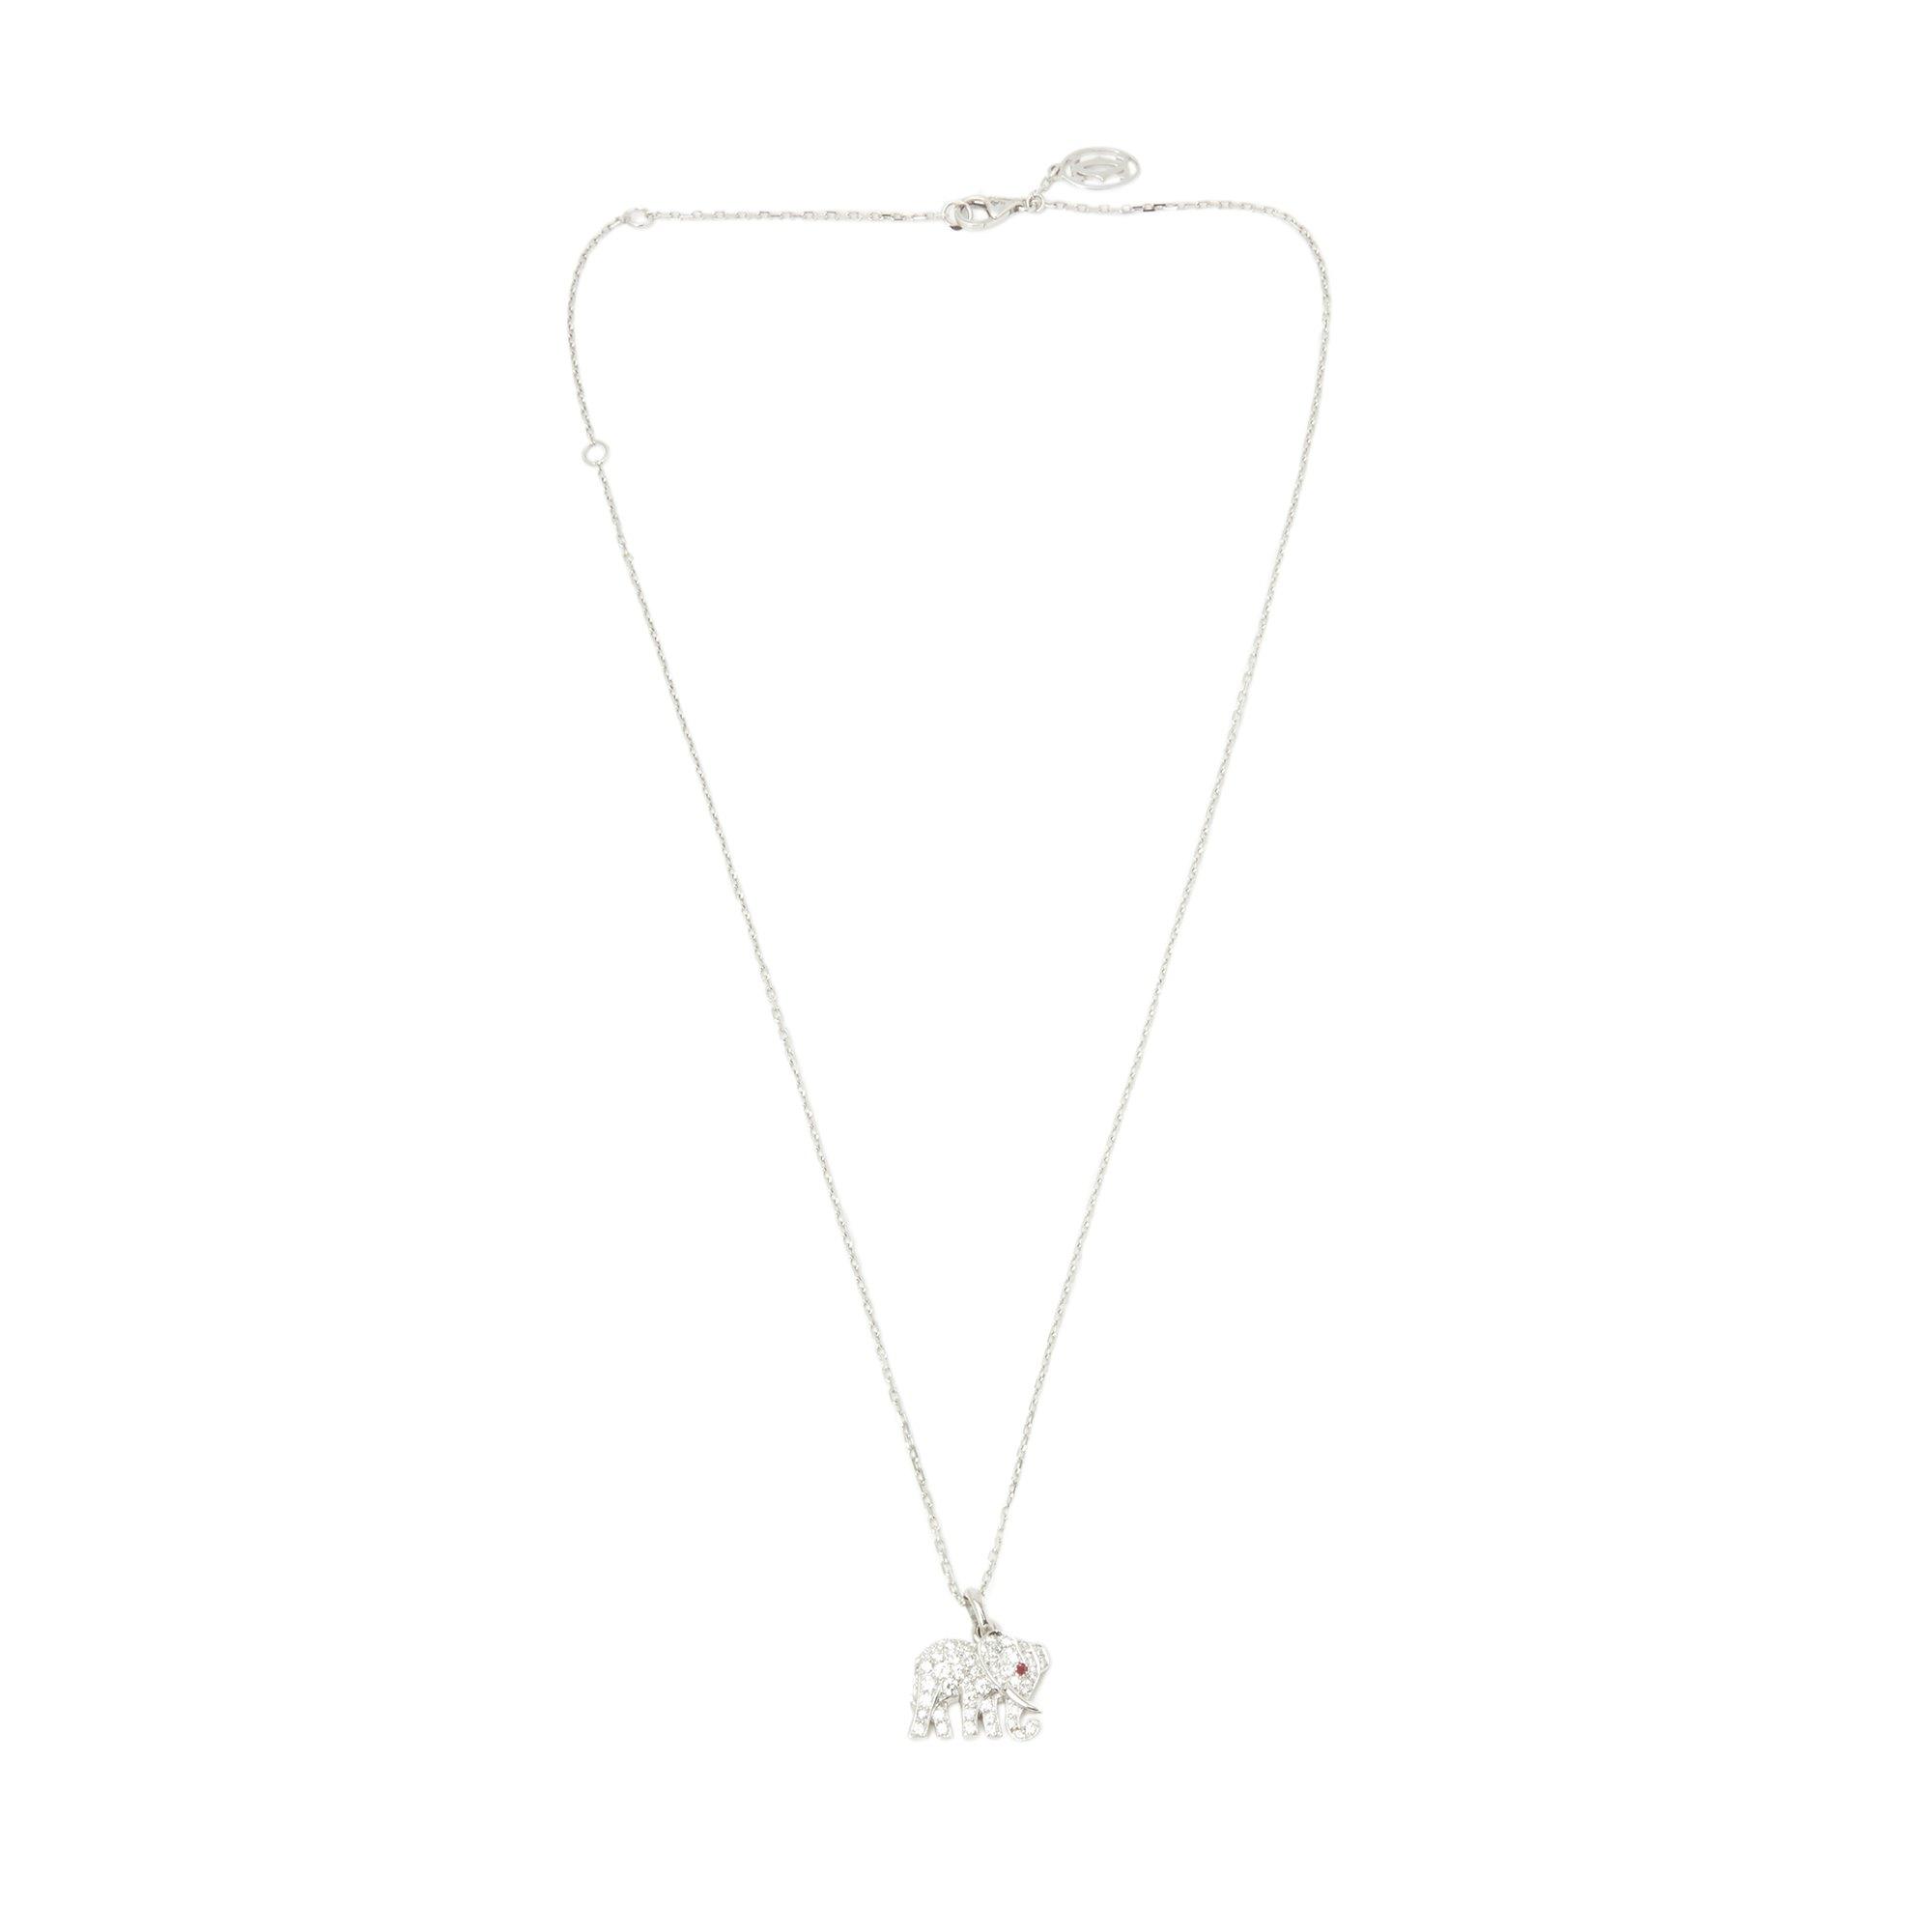 Cartier 18k White Gold Small Bespoke Elephant Pendant Necklace